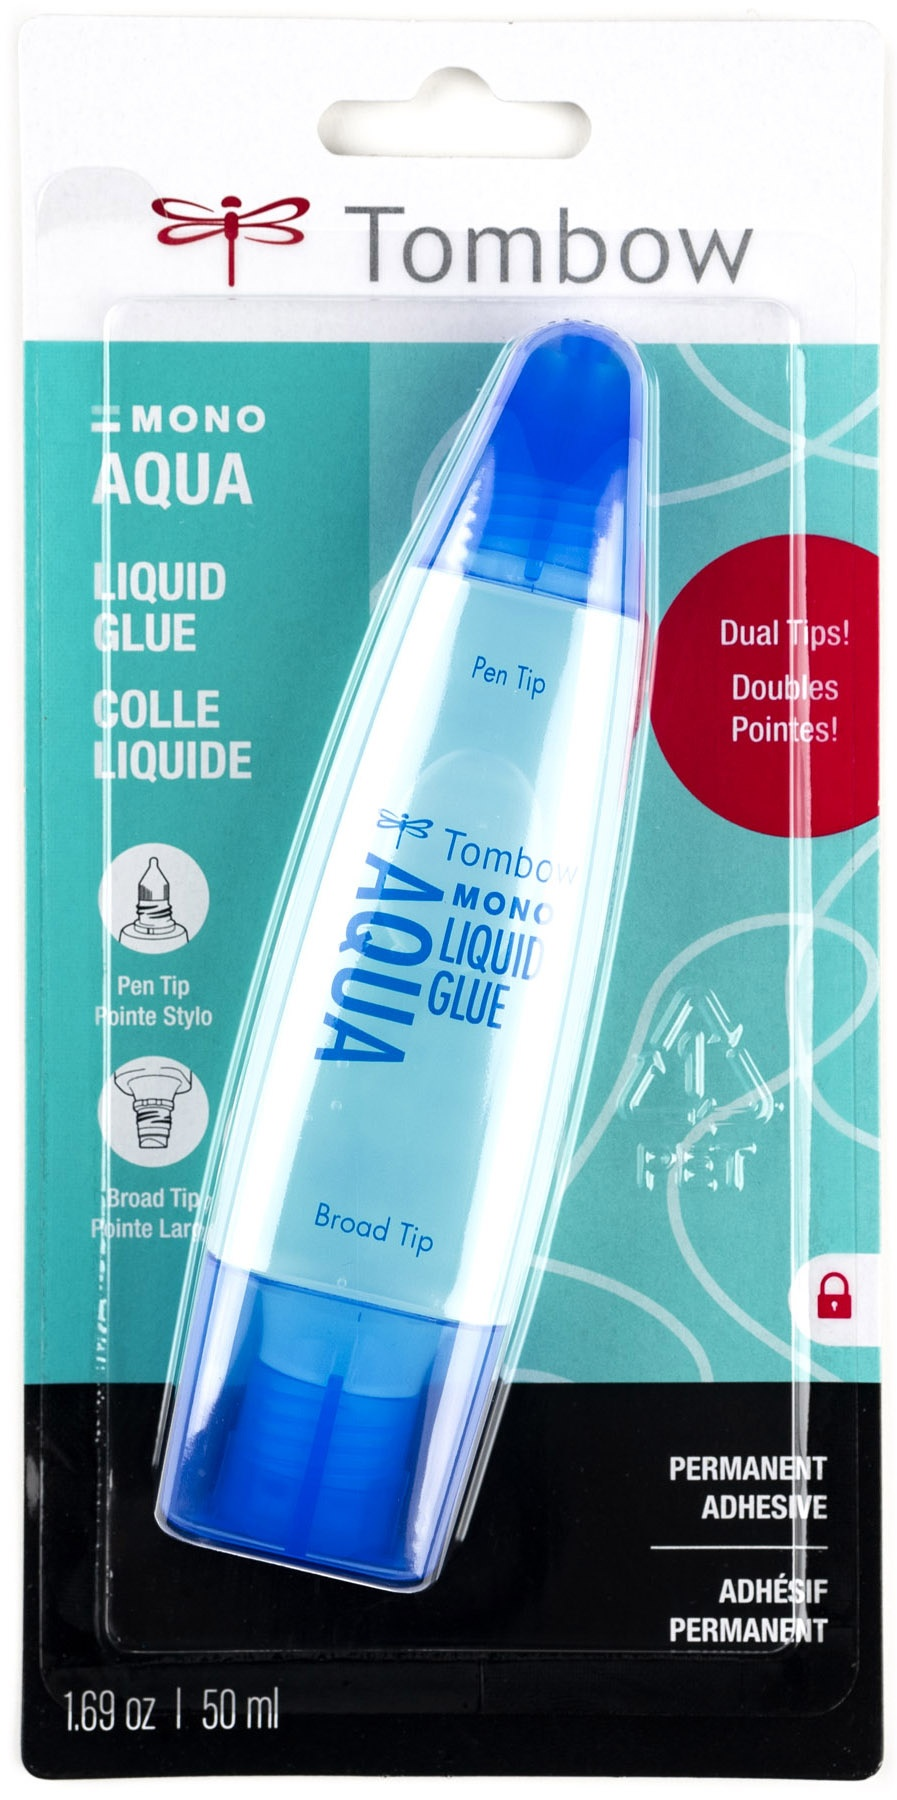 1.69 Oz -Mono Aqua Liquid Glu